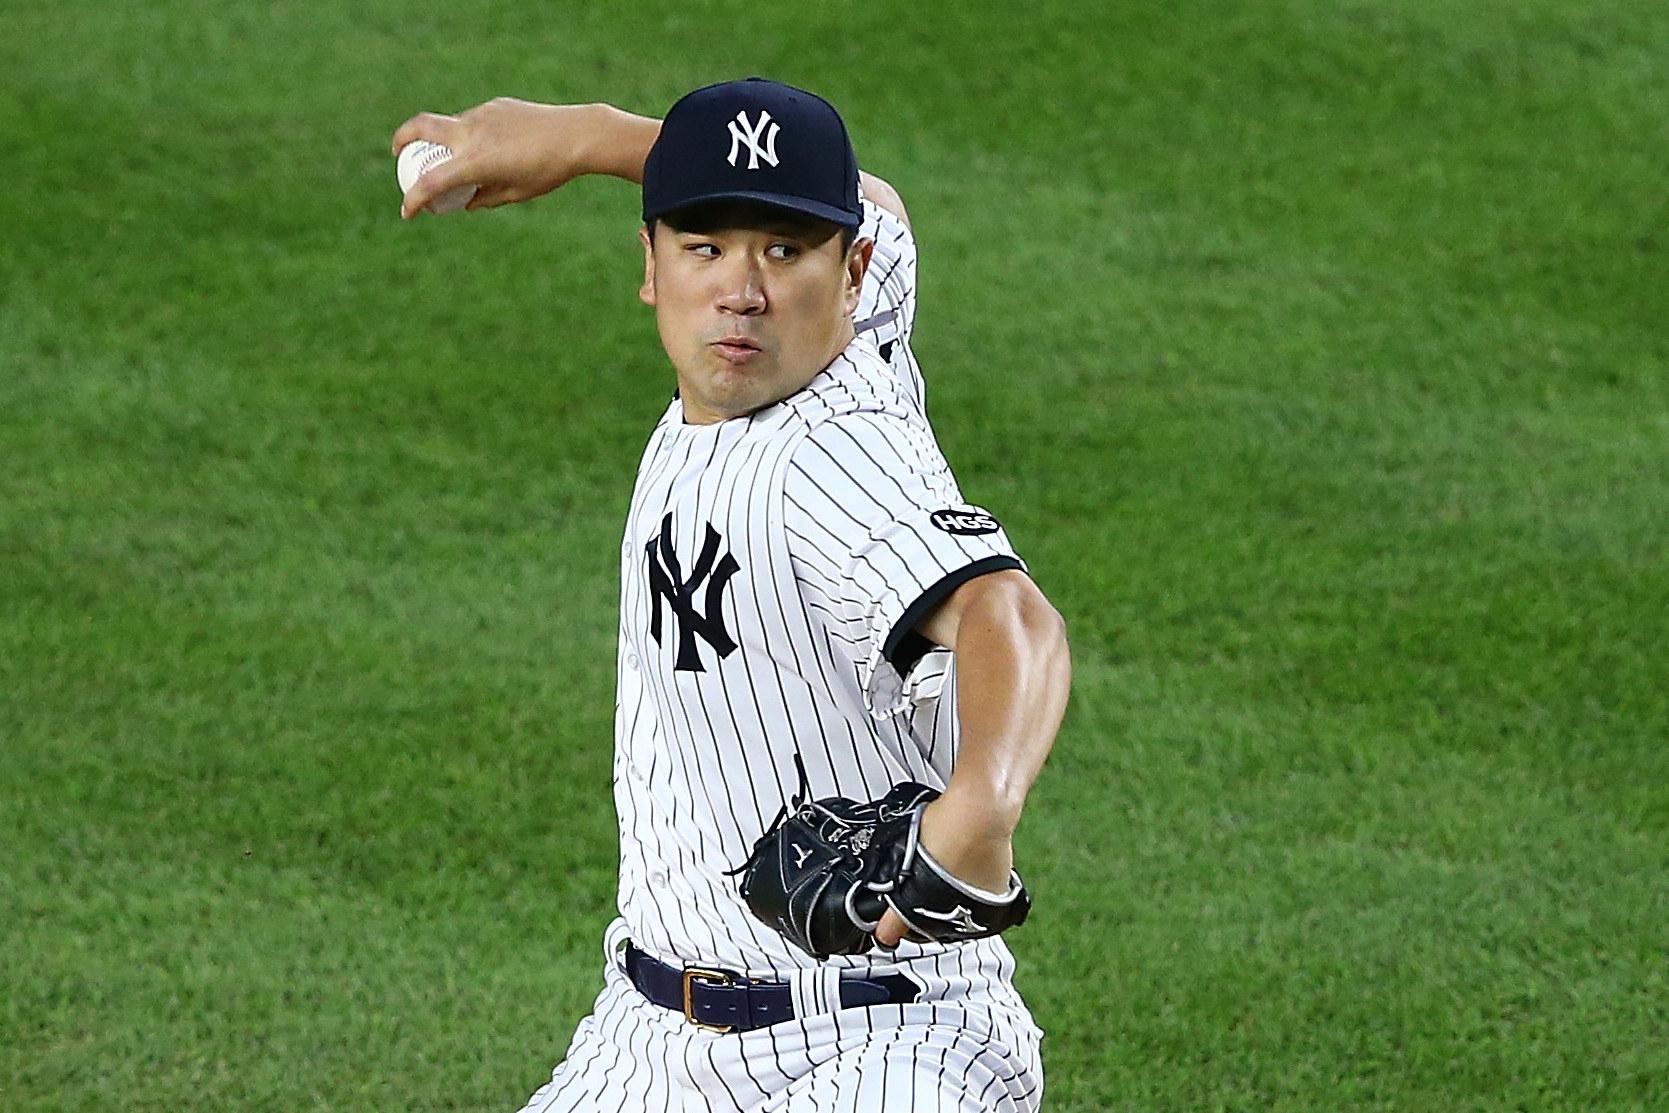 Masahiro Tanaka pitches baseball in a New York Yankees uniform